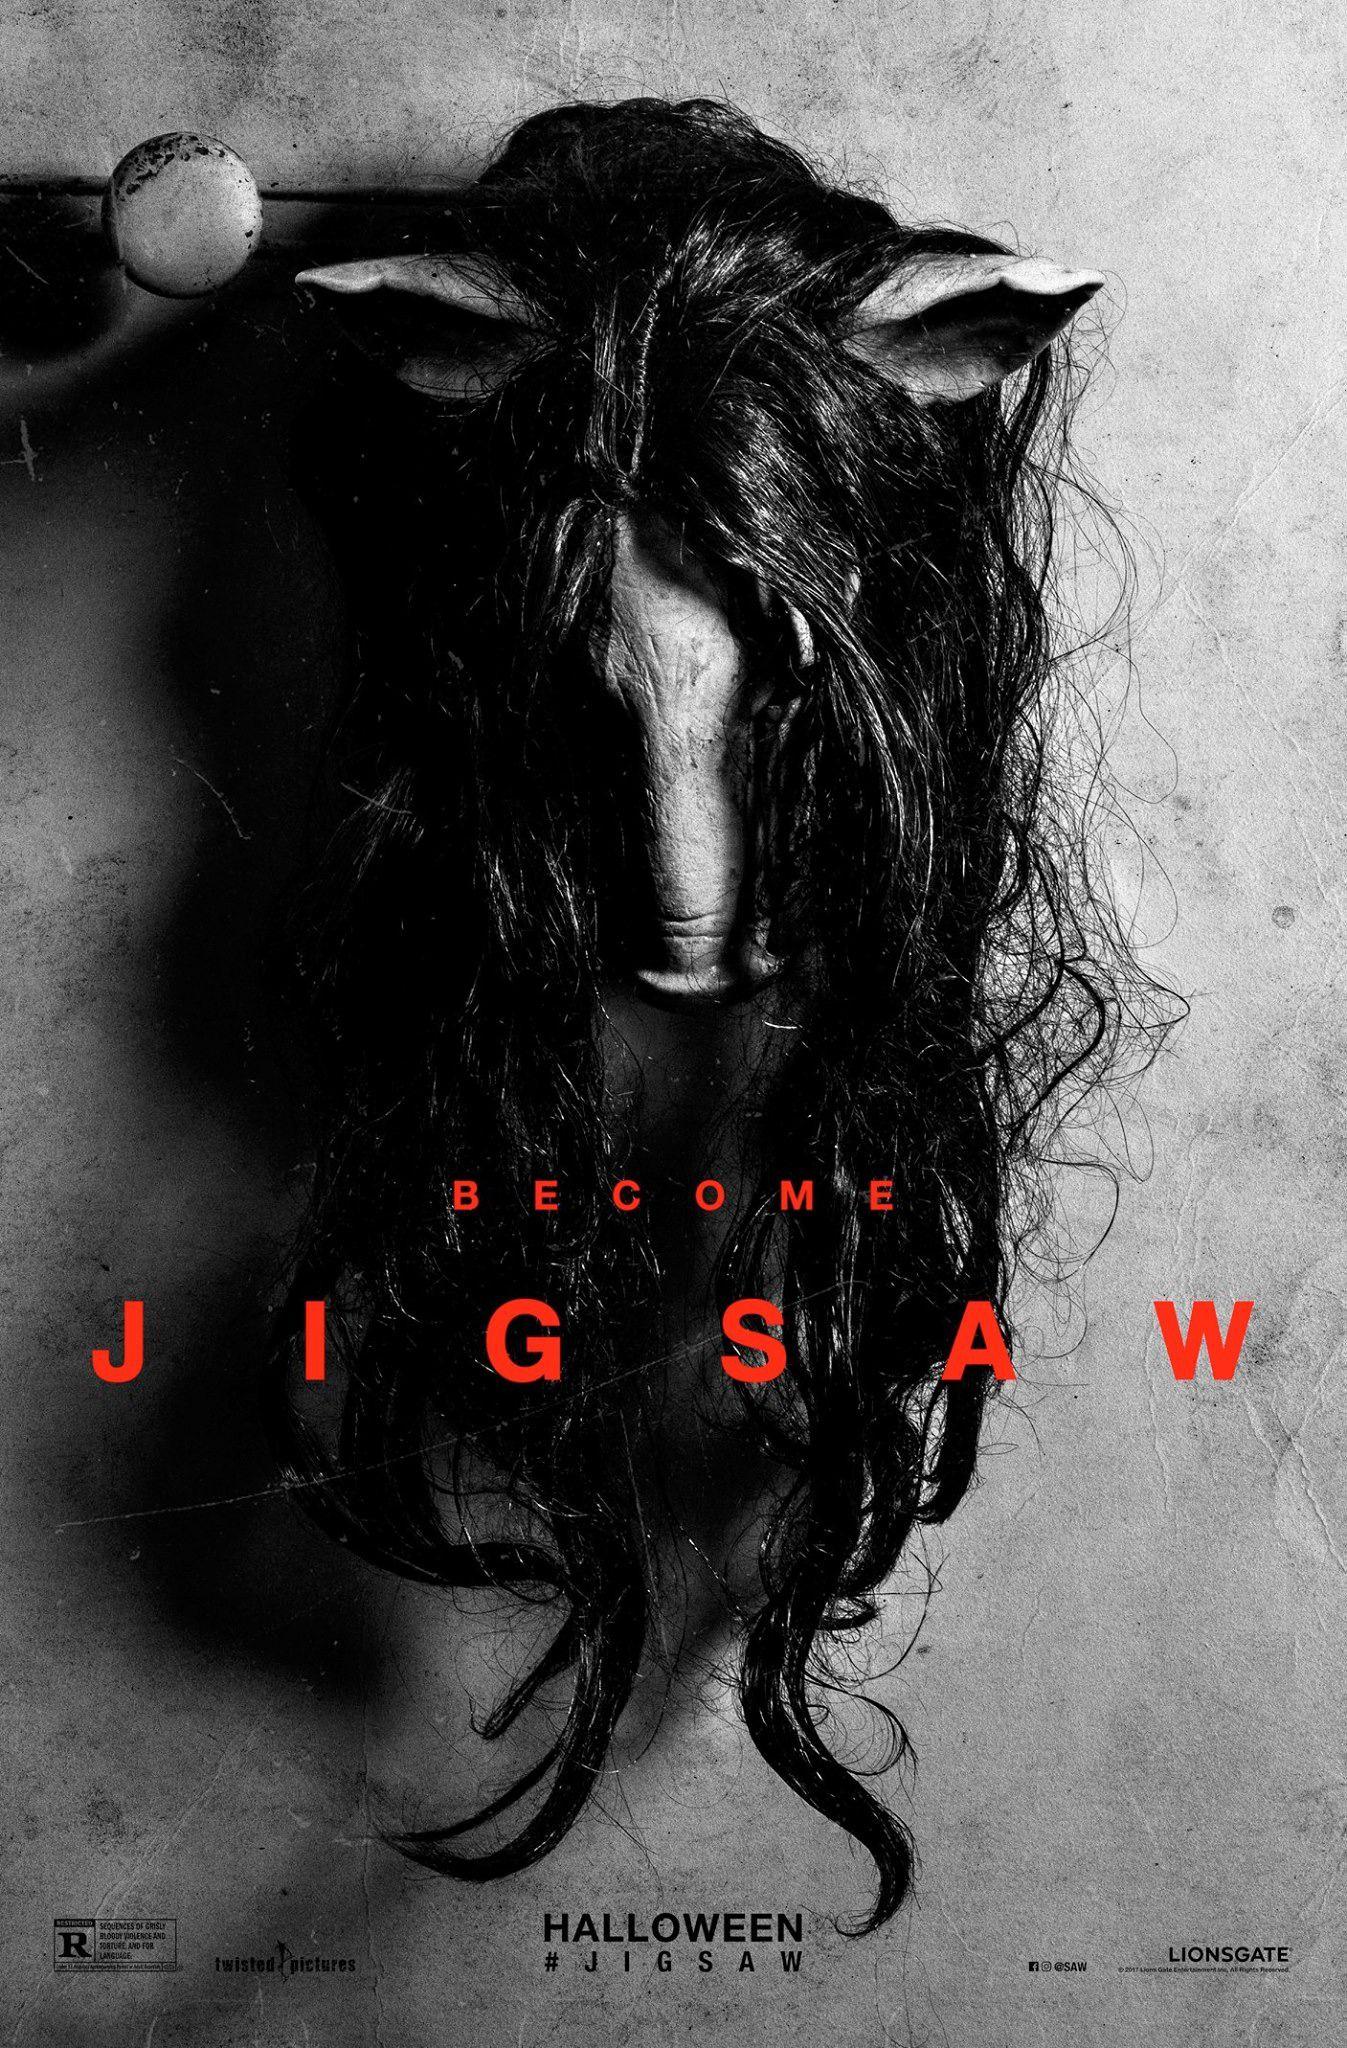 Jigsaw 2017 Hd Wallpaper From Gallsourcecom Movies Pinterest